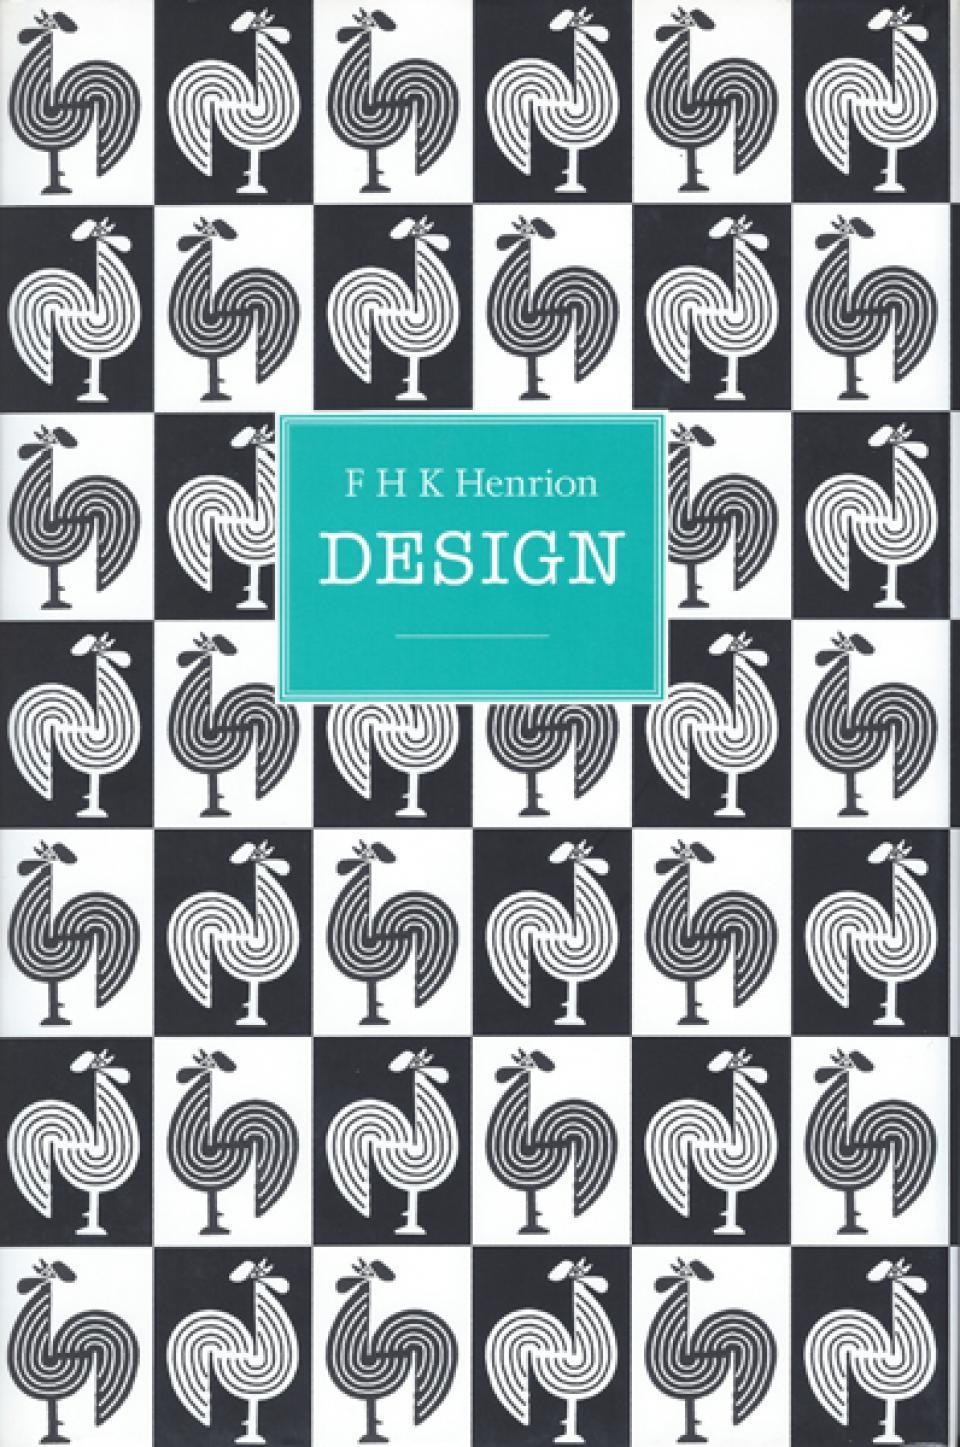 F H K Henrion by Ruth Artmonsky